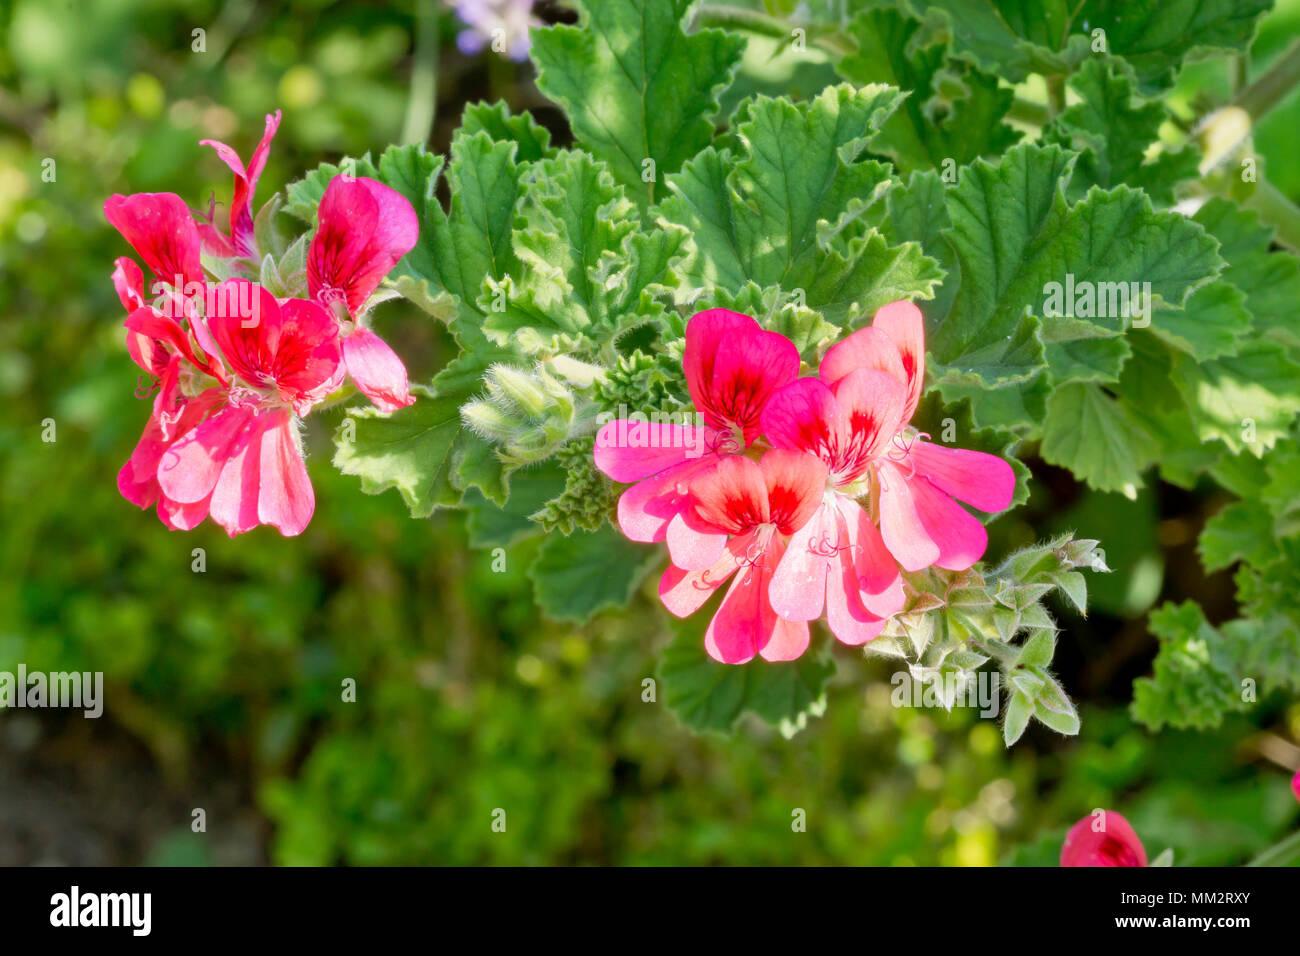 Pelargonium 'Shrubland Pet' in bloom in a garden Stock Photo